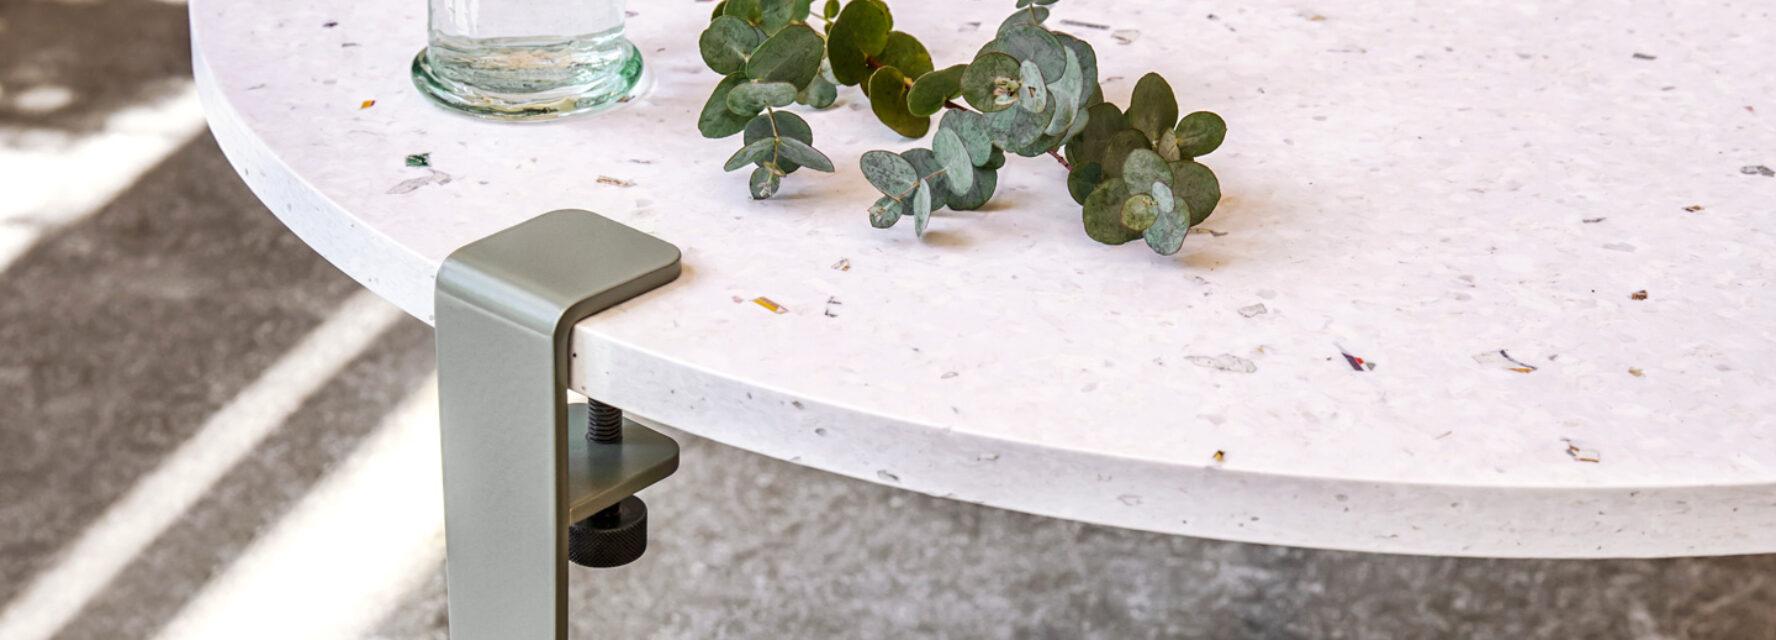 Coffee table legs - TIPTOE